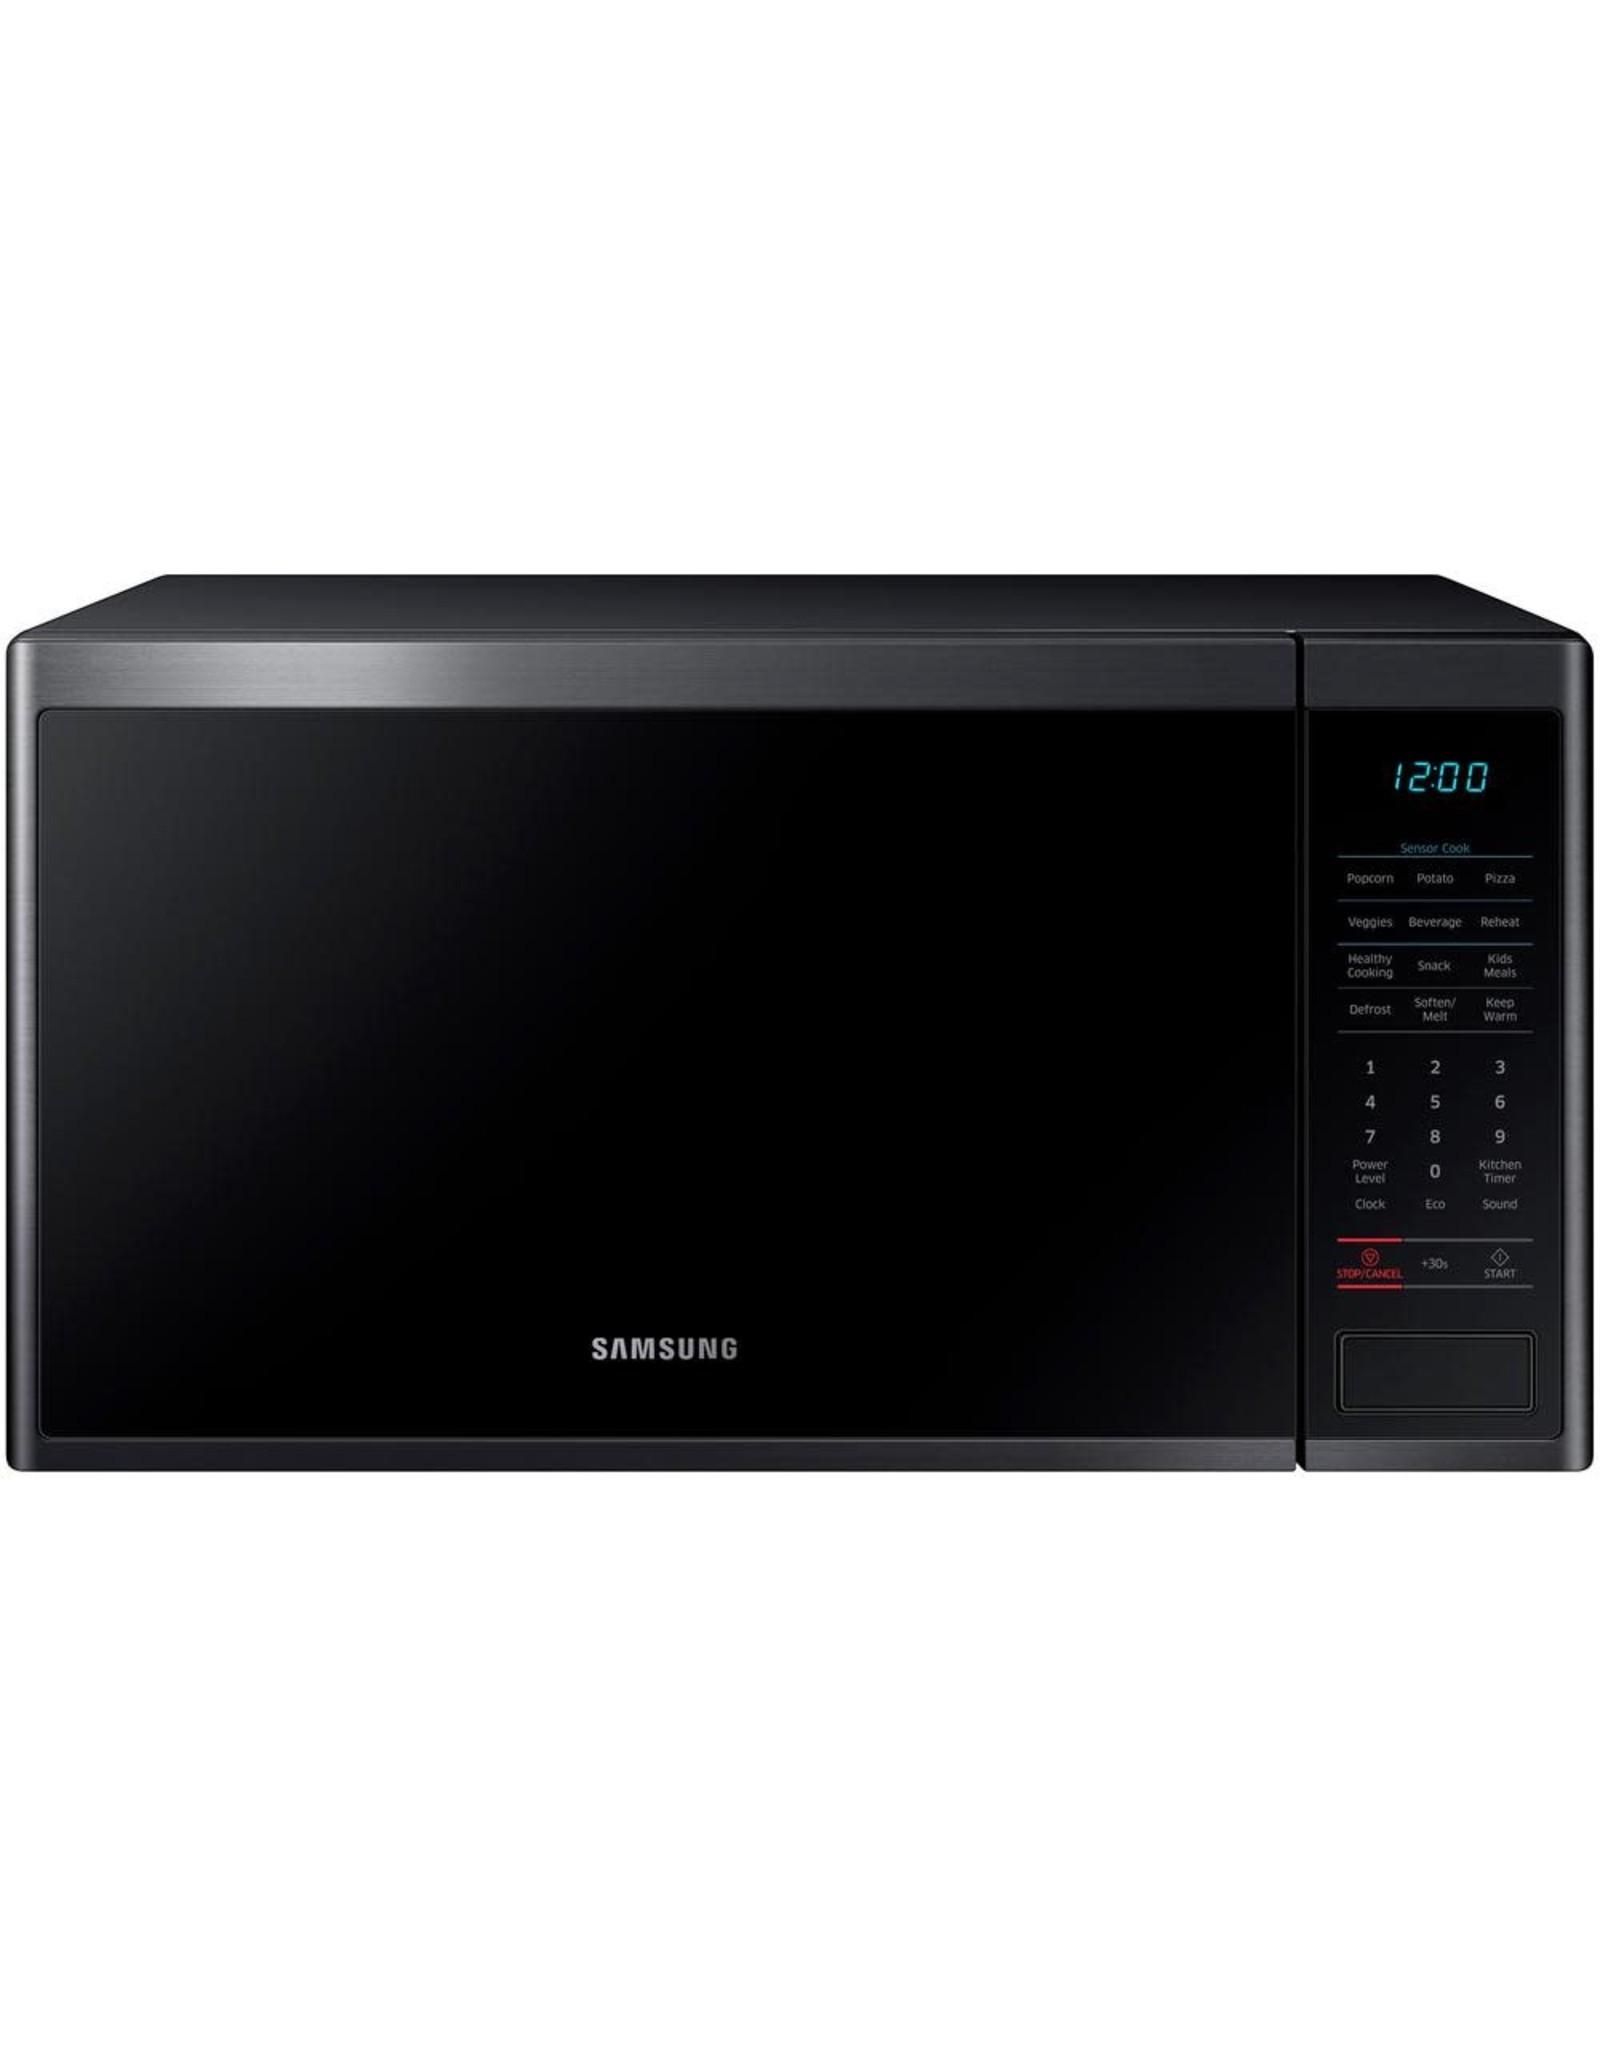 SAMSUNG MS14K6000AG Samsung 1.4 Cu. Ft. Microwave, Ceramic Enamel, Sensor Cook, Tact & Dial, LED